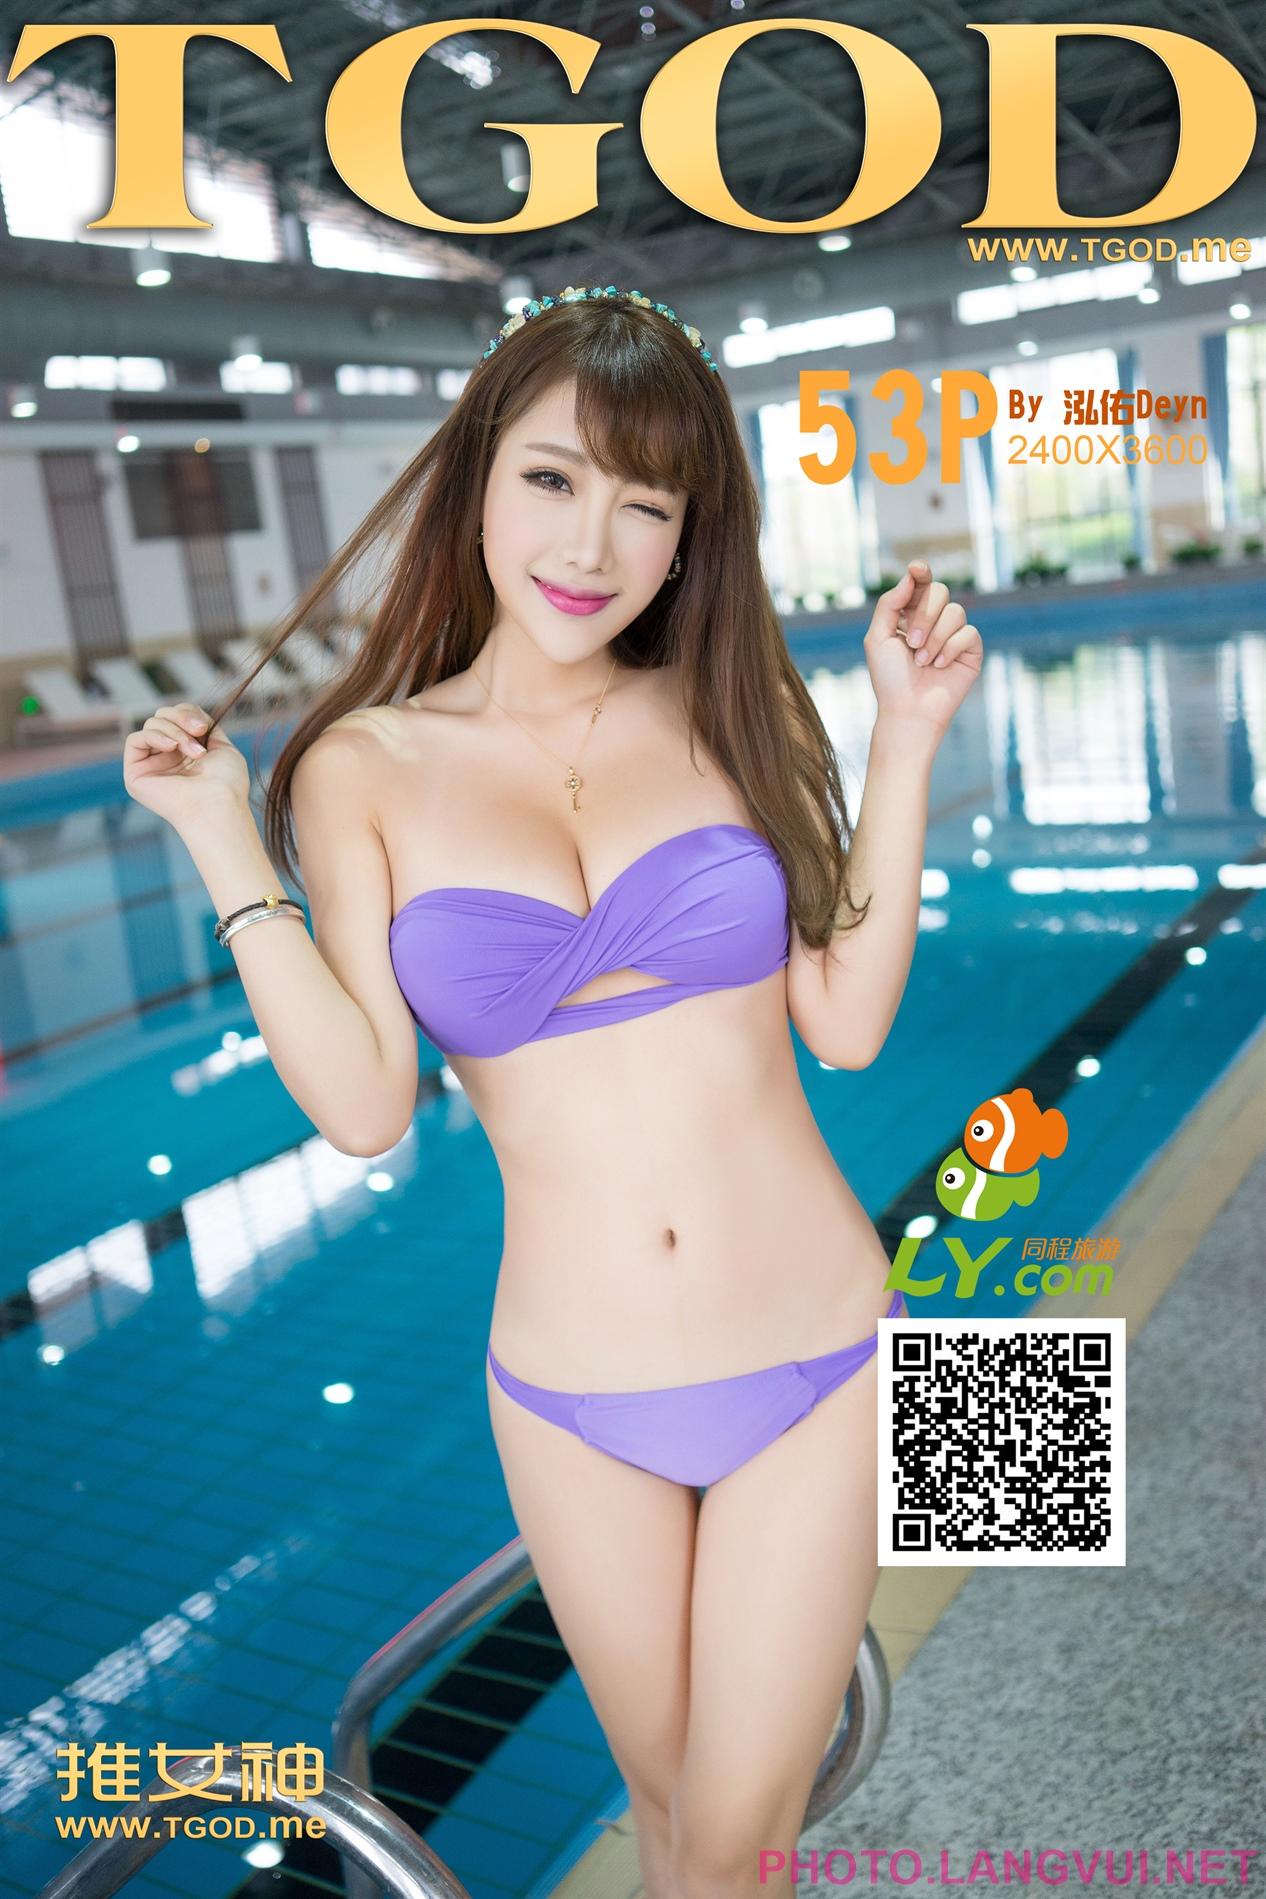 TGOD No 27112014 Akiki